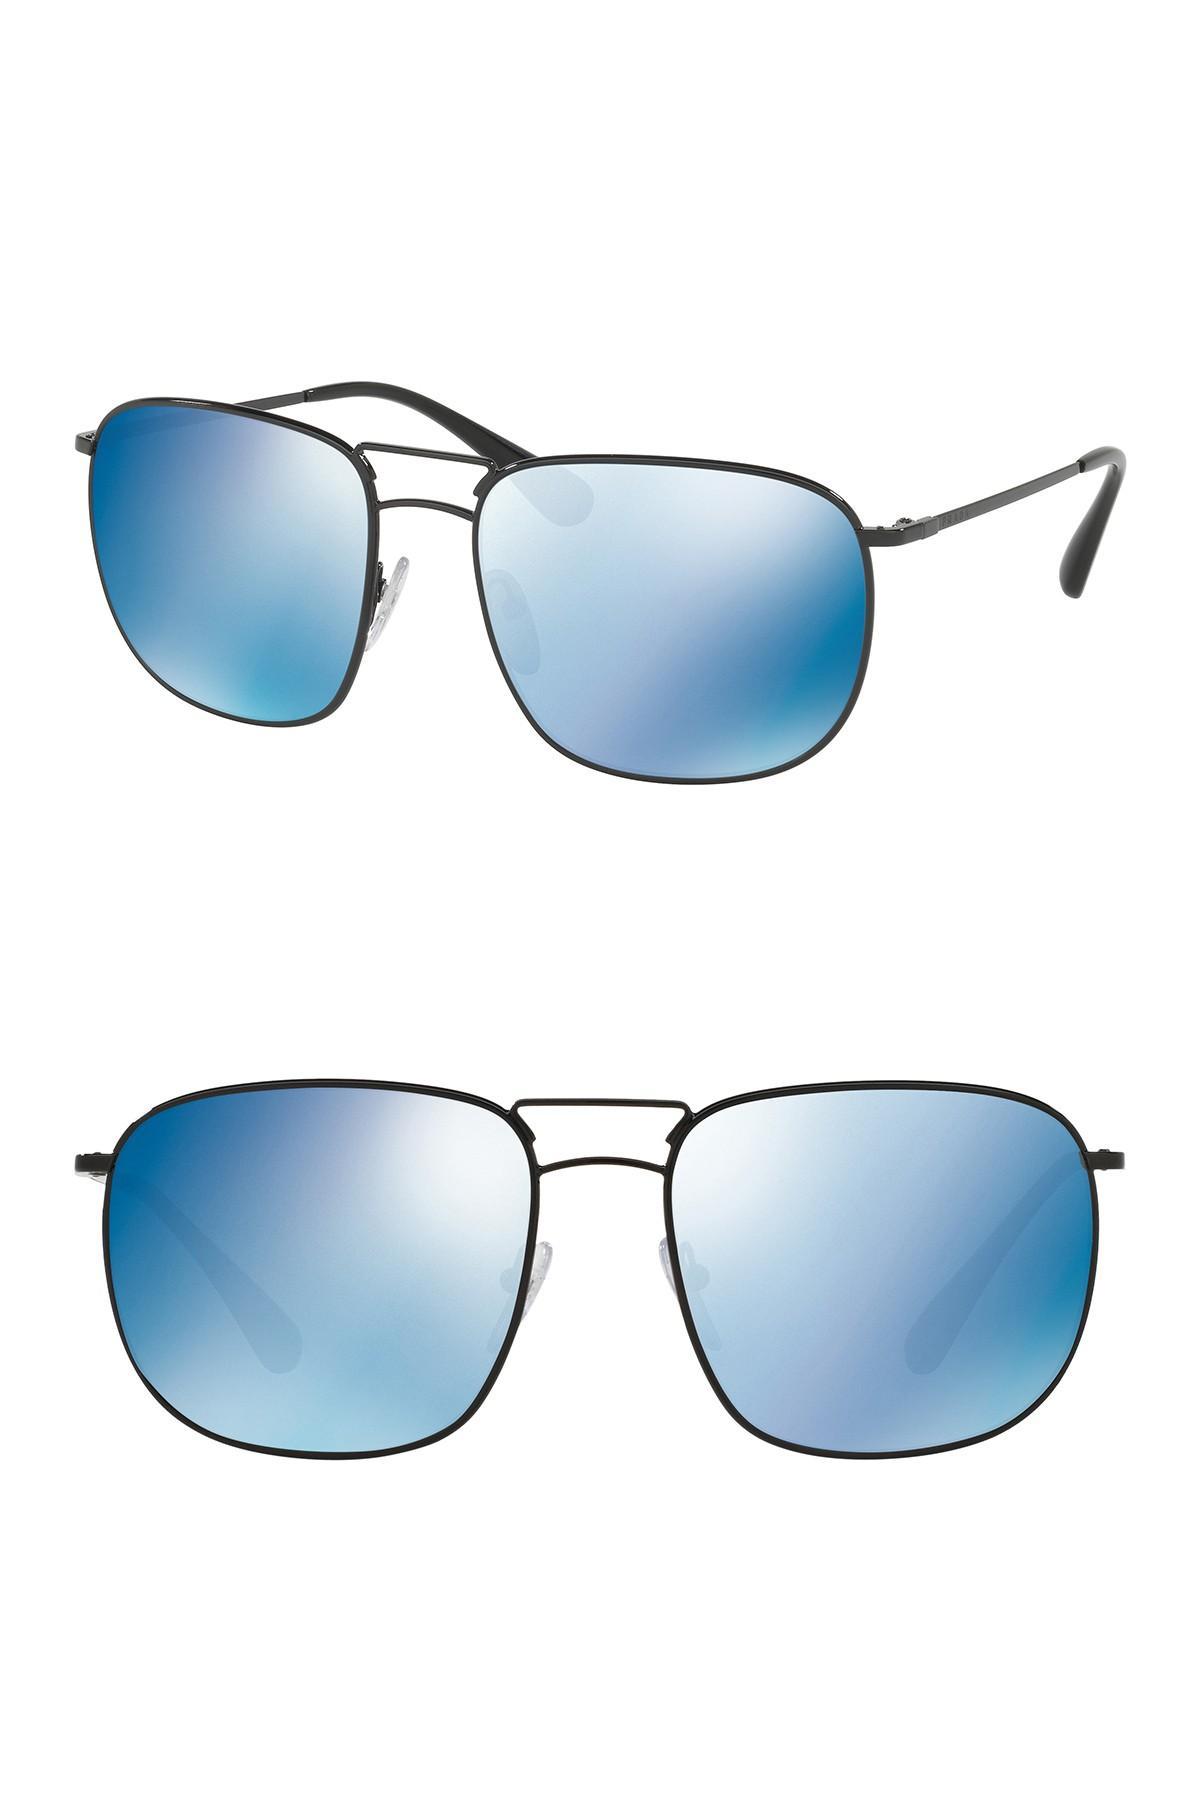 0e579da6b2 Lyst - Prada Pillow Conceptual 60mm Navigator Sunglasses in Black ...